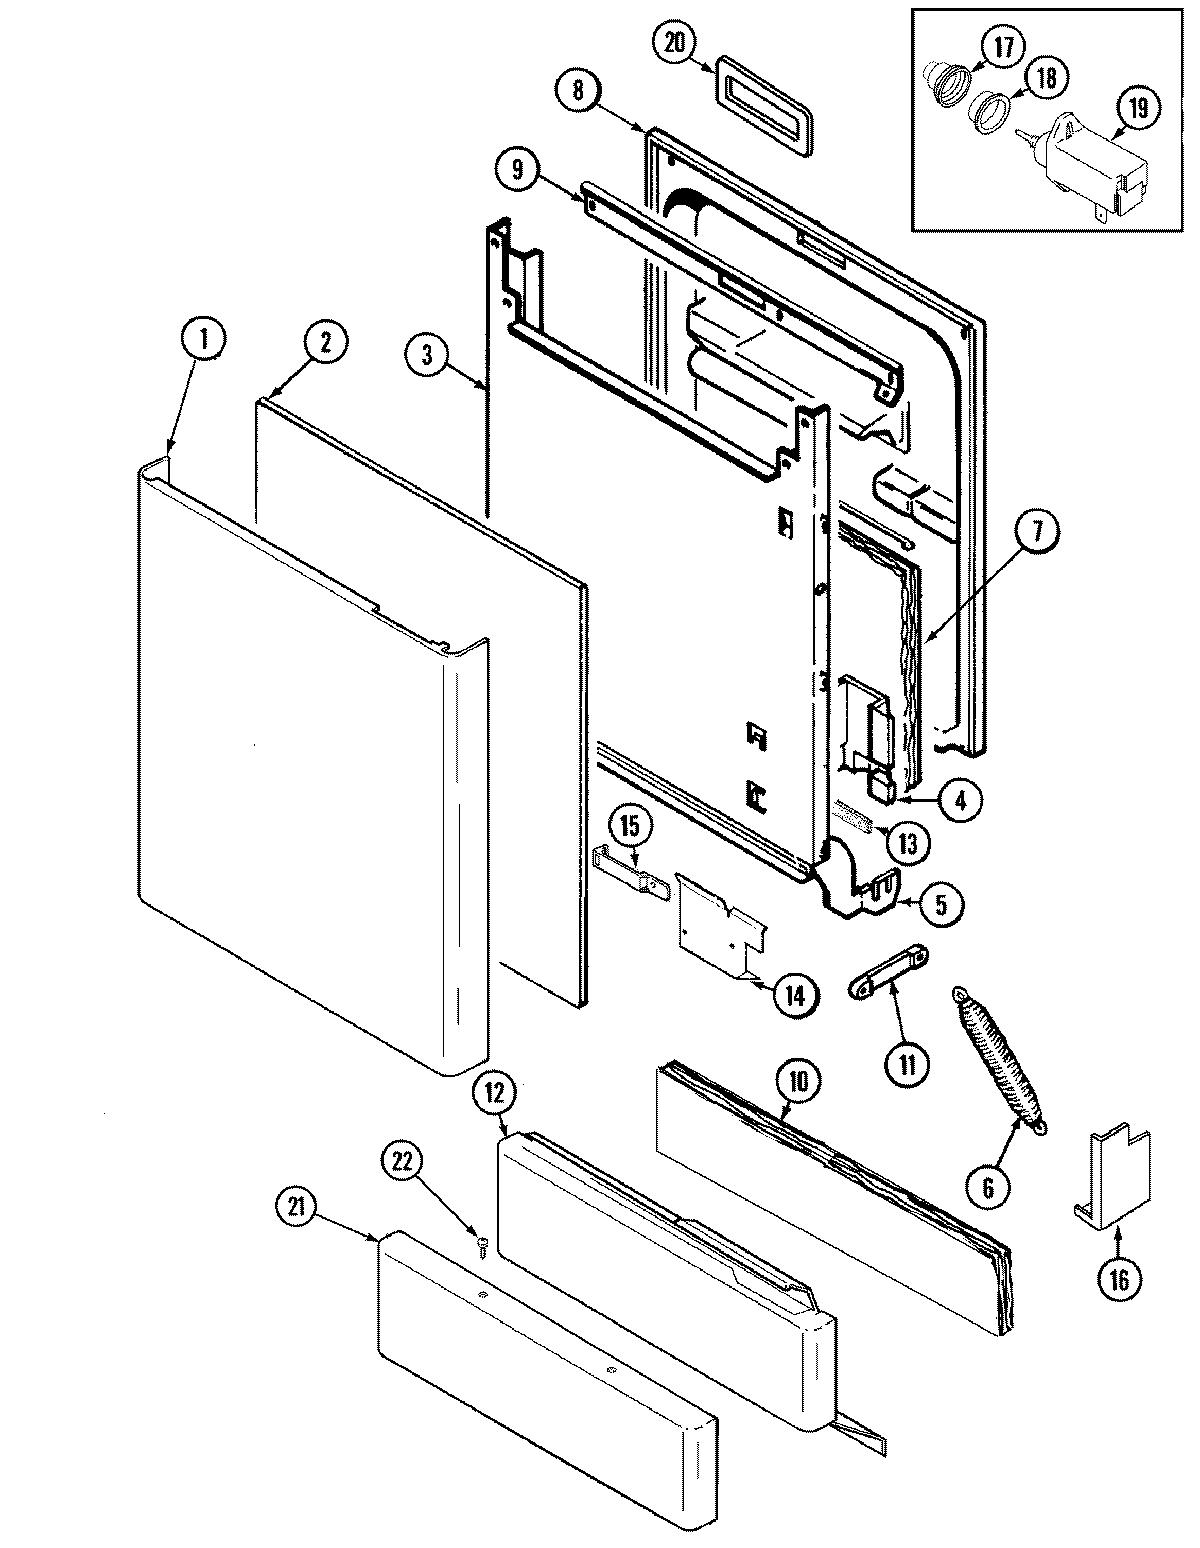 maytag dishwasher wiring diagram meyer snow plow lights model mdb7100aww genuine parts